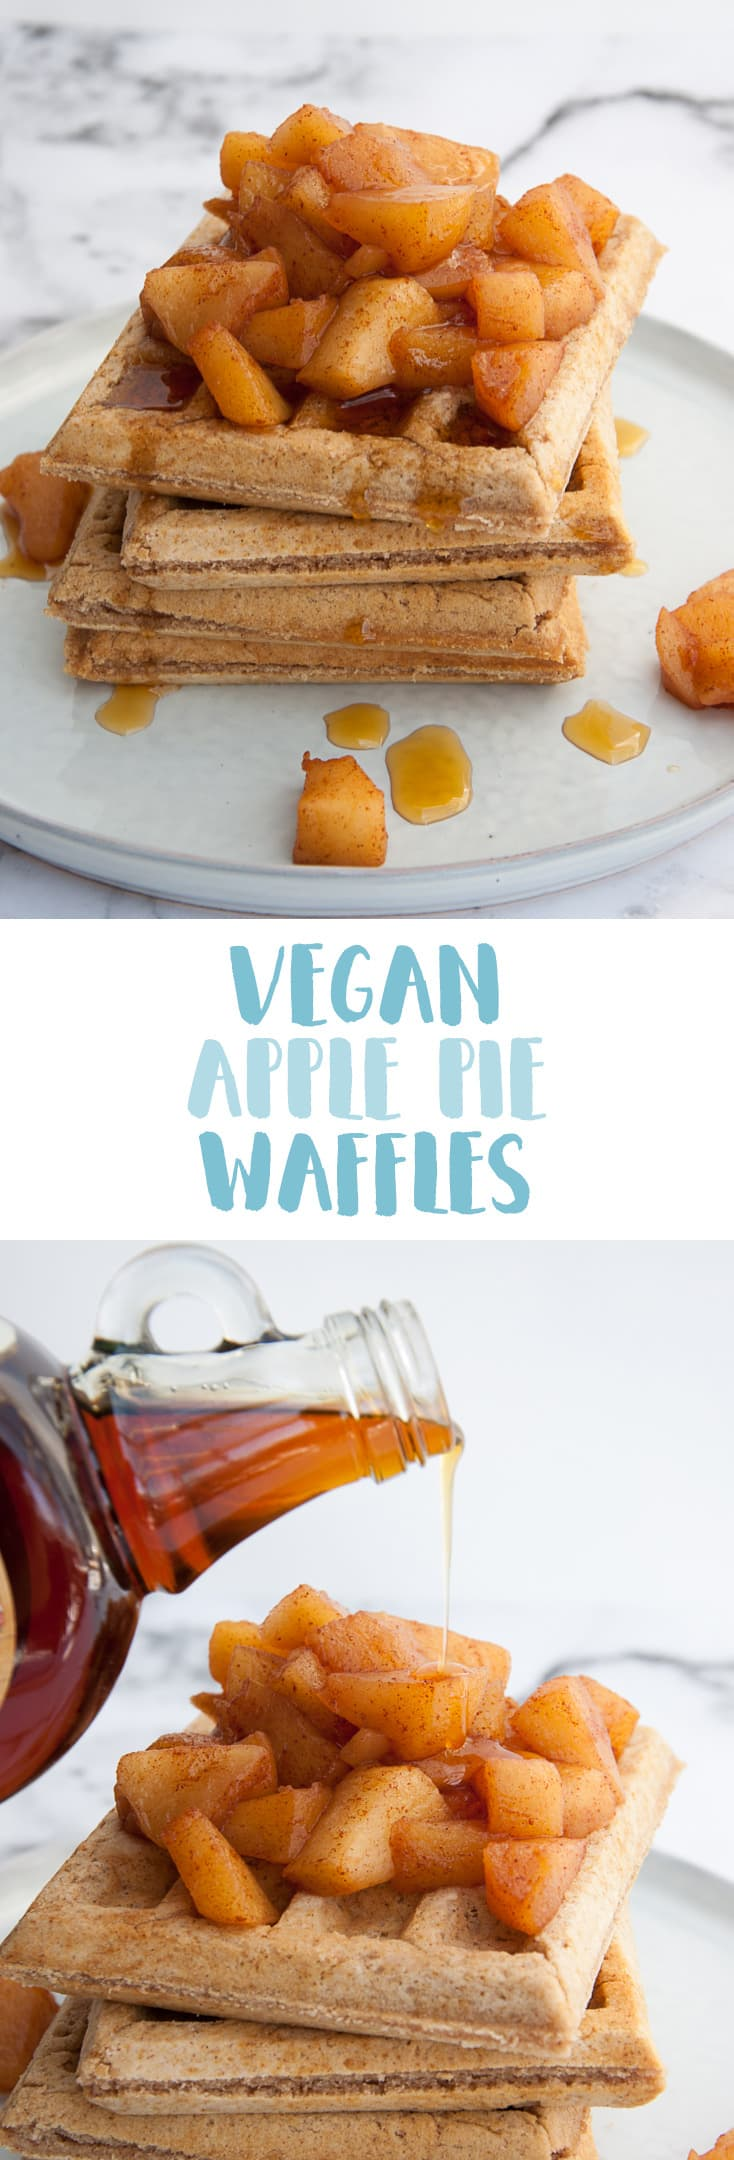 Vegan Apple Pie Waffles | ElephantasticVegan.com #vegan #waffles #applepie #apple #breakfast